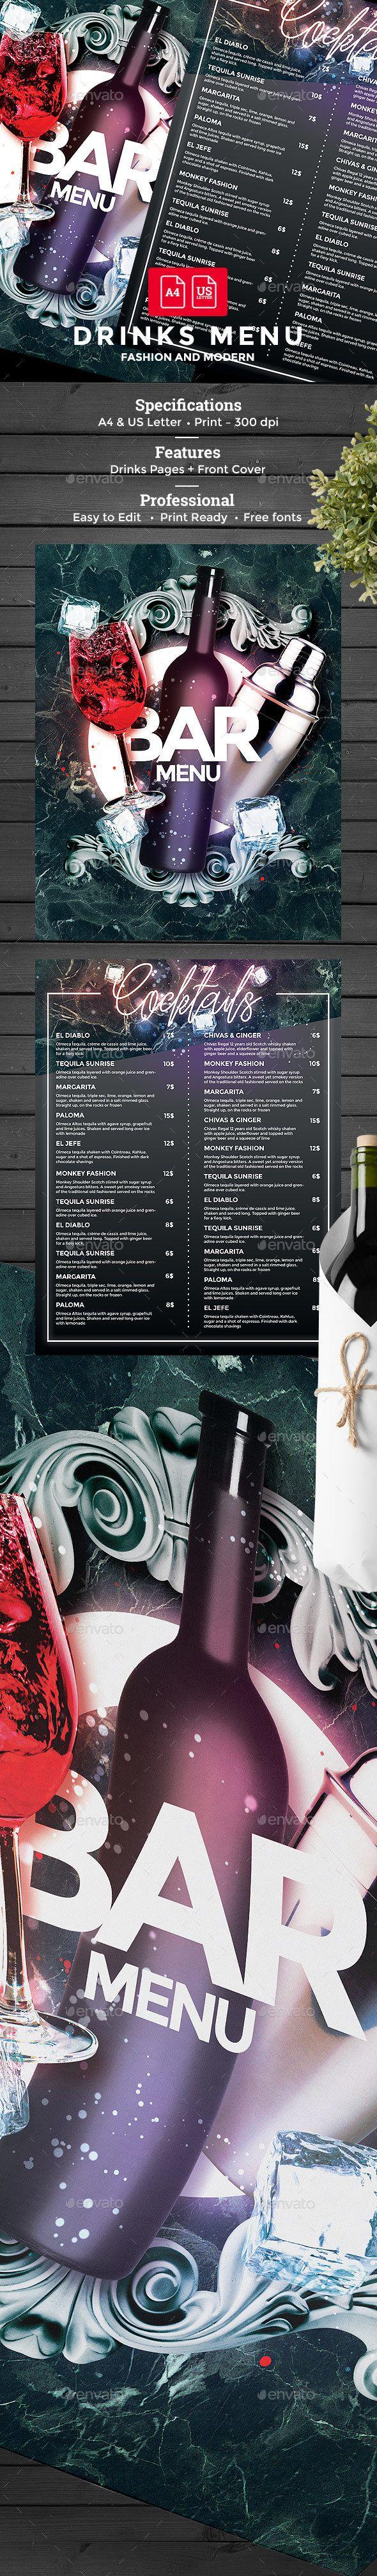 Cocktail Drinks #Menu - #Food Menus Print #Templates Download here:  https://graphicriver.net/item/cocktail-drinks-menu/19515115?ref=alena994